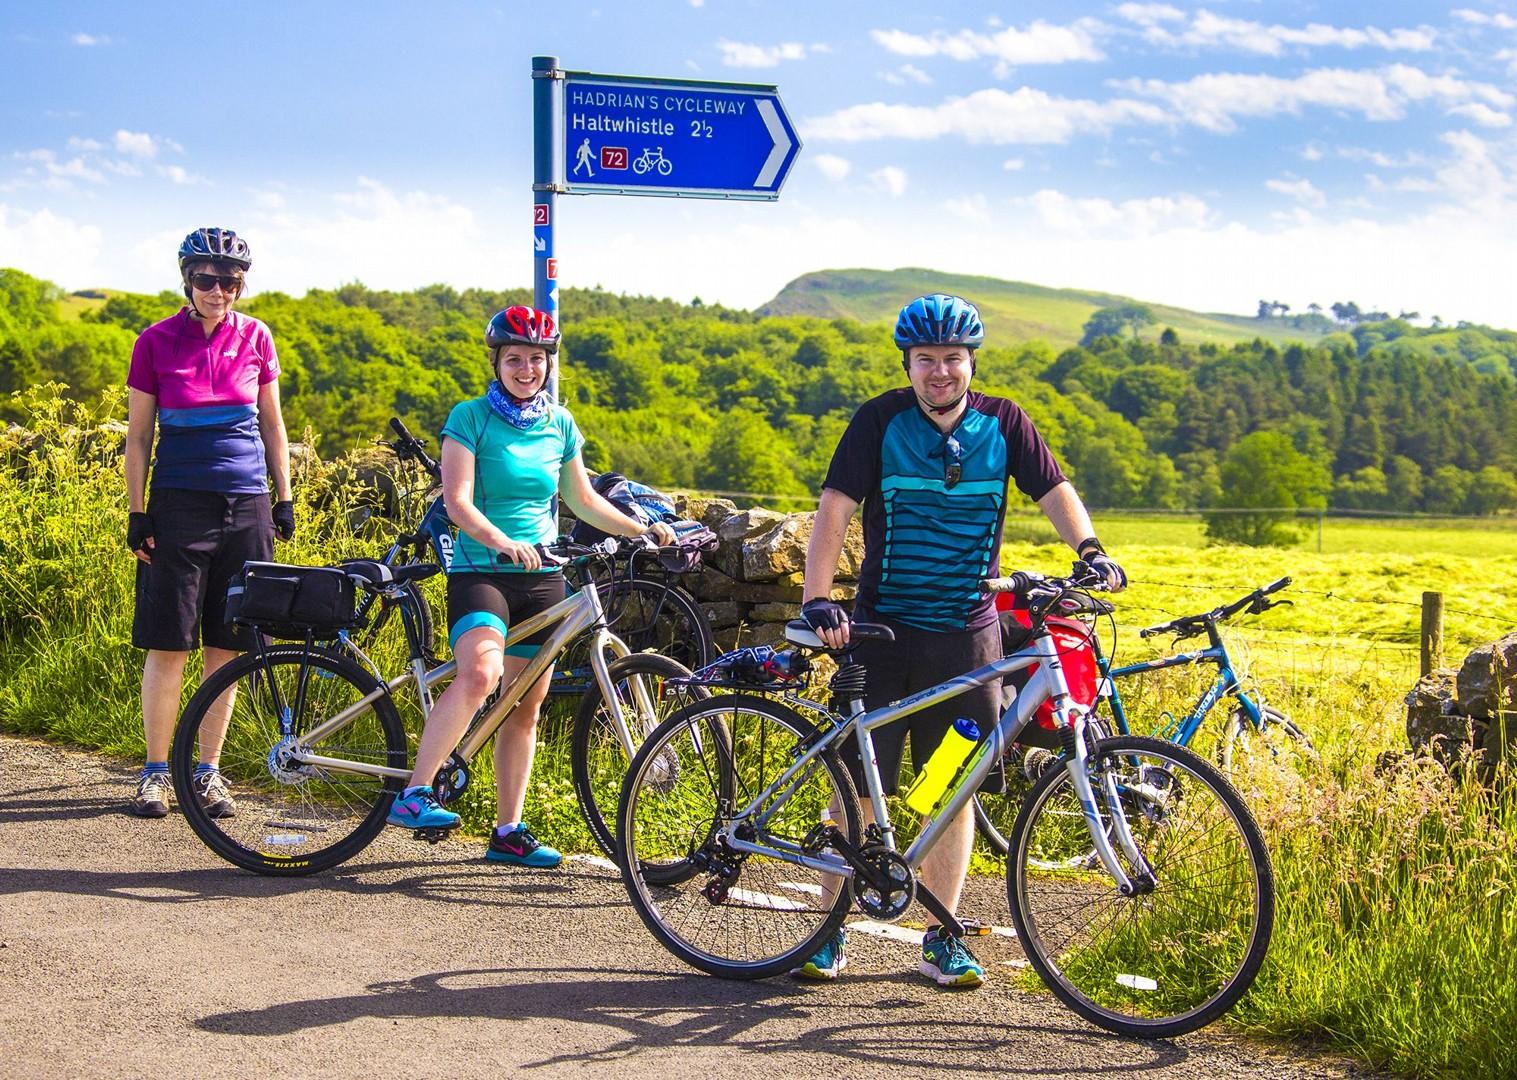 1806_0237-2.jpg - UK - Hadrian's Cycleway - 4 Days Cycling - Self-Guided Leisure Cycling Holiday - Leisure Cycling